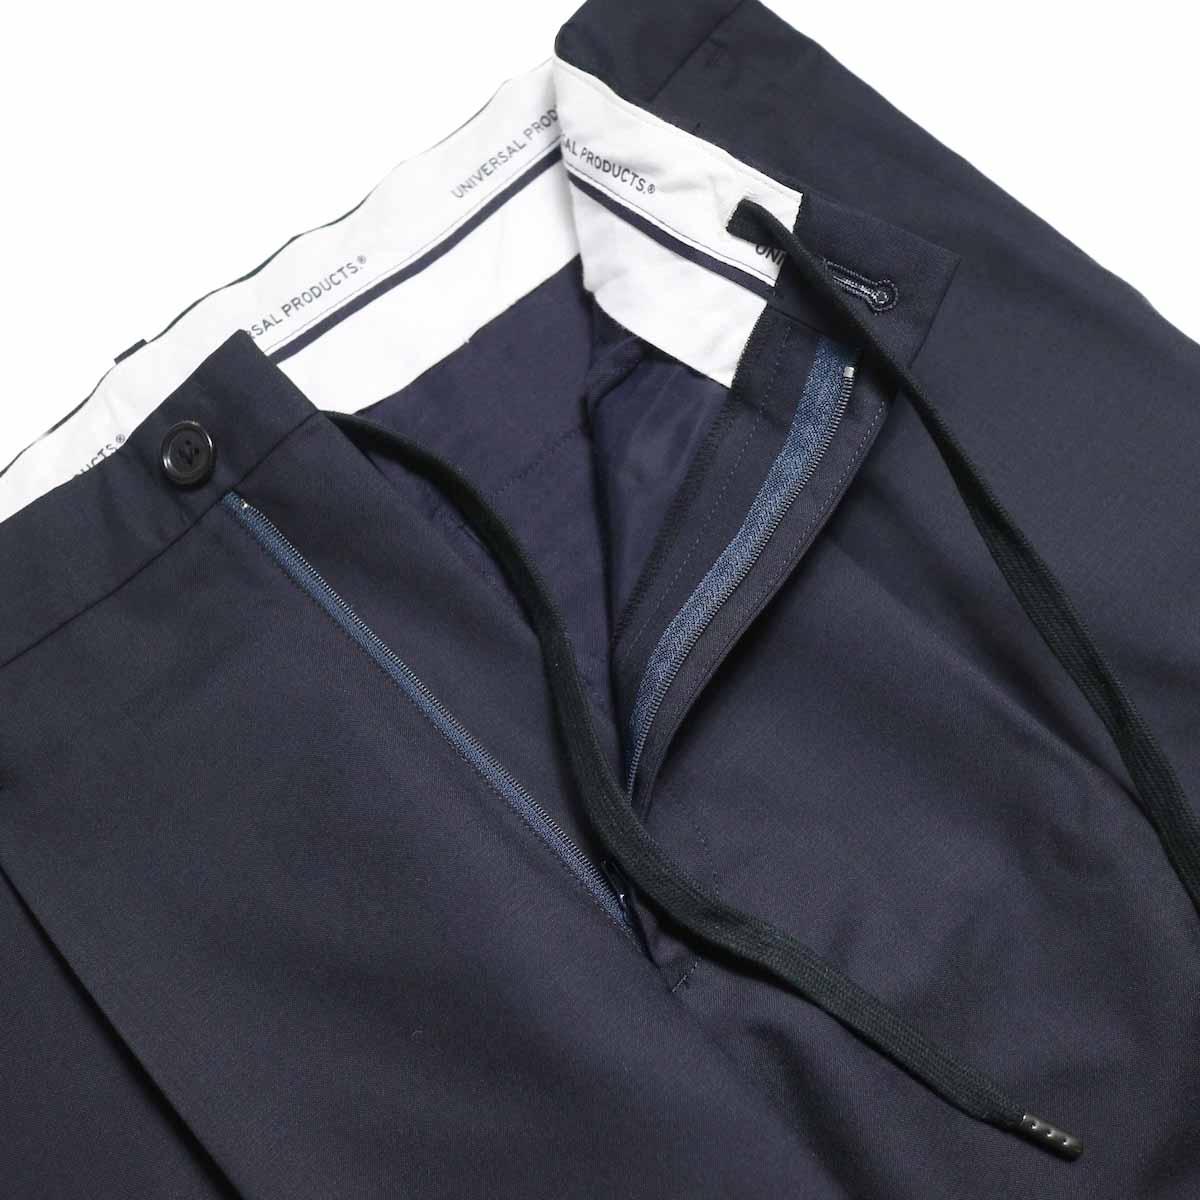 UNIVERSAL PRODUCTS / Wool Easy Slacks -Navy ドローコード